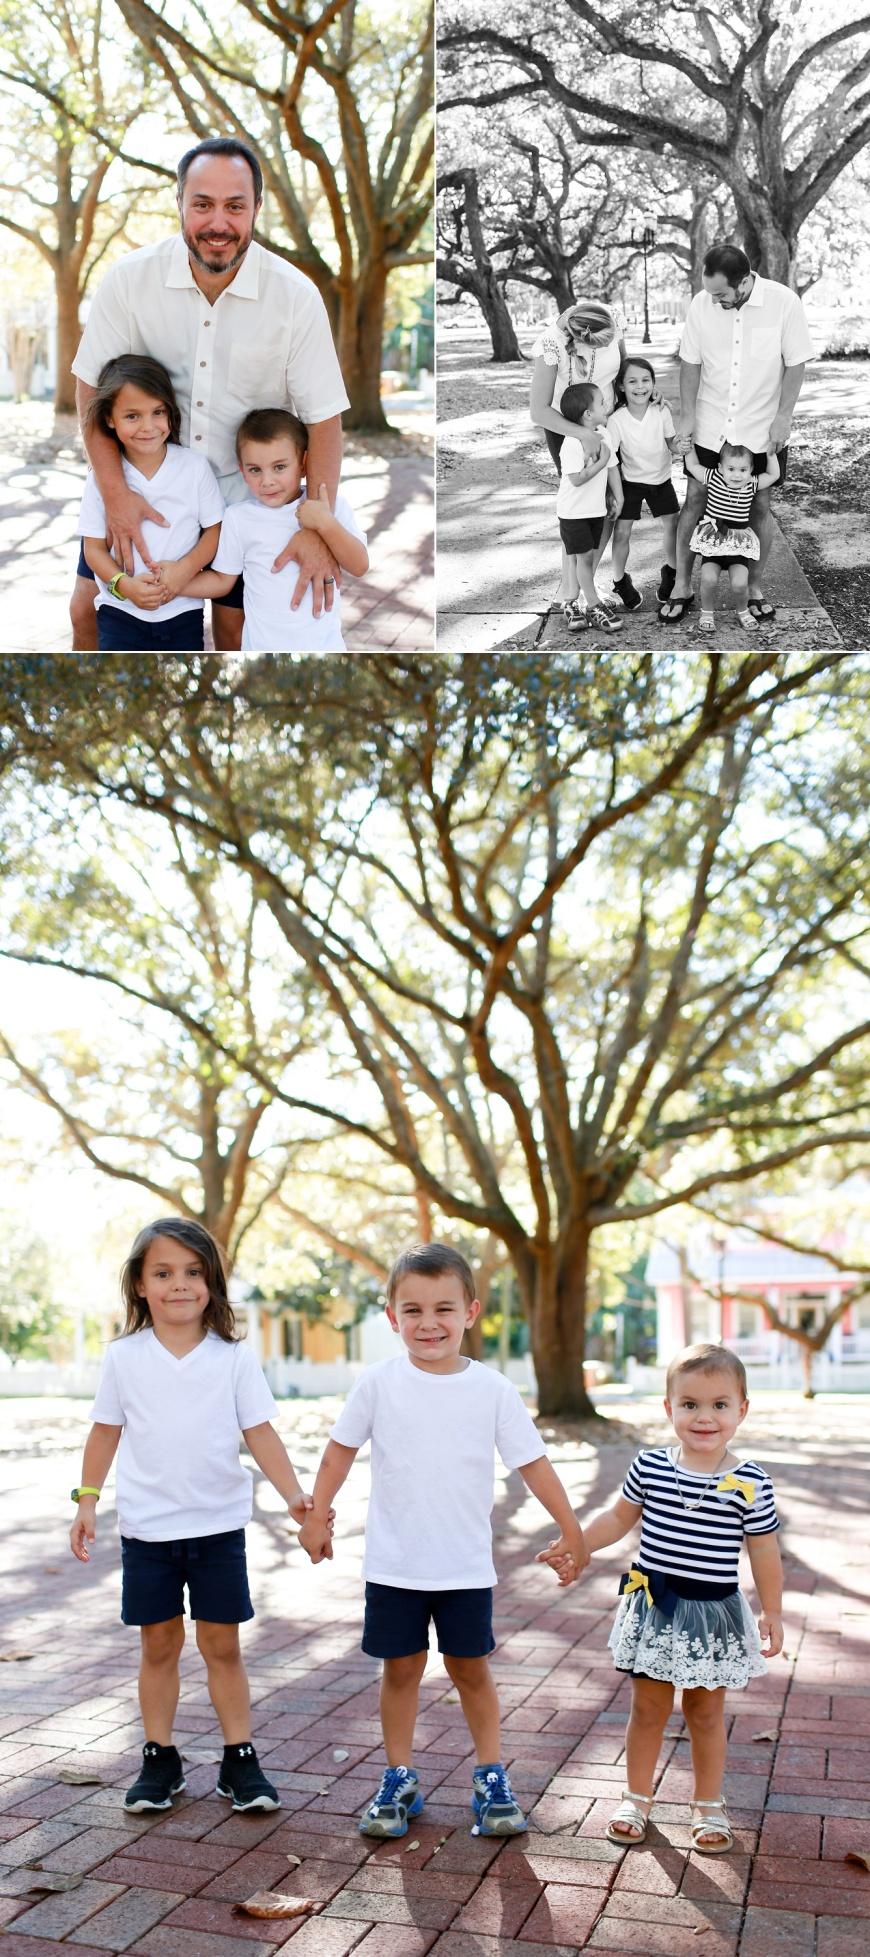 Seville-Square-Pensacola-Florida-Family-Photographer_1001.jpg